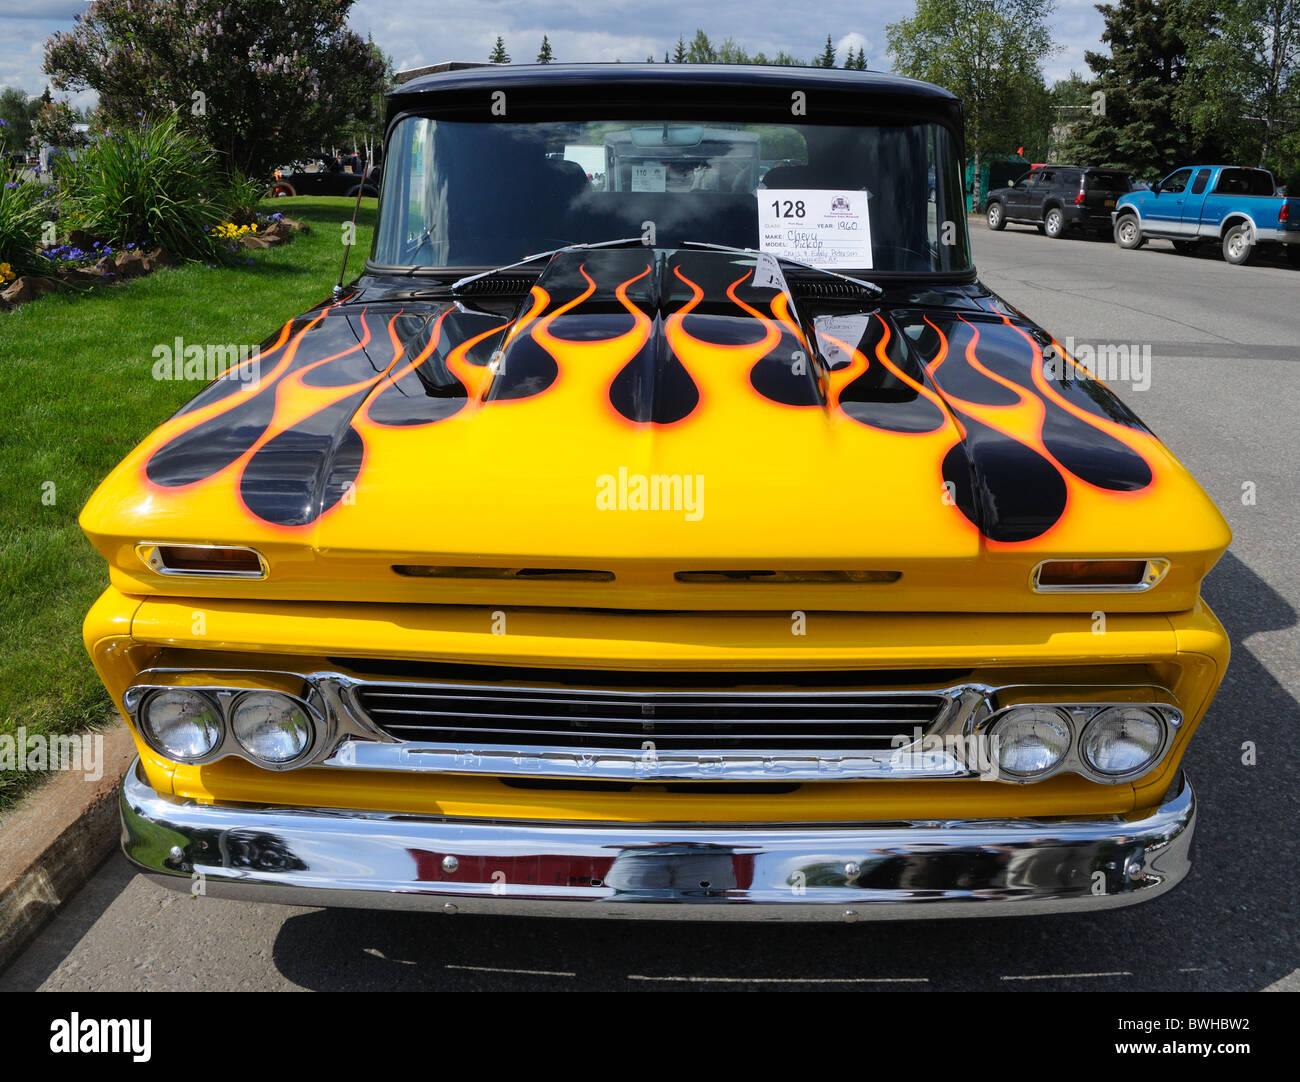 Truck chevy 1960 truck 1960 Chevy Pickup, 2010 Alaska Midnight Sun Cruise-In Auto Show ...